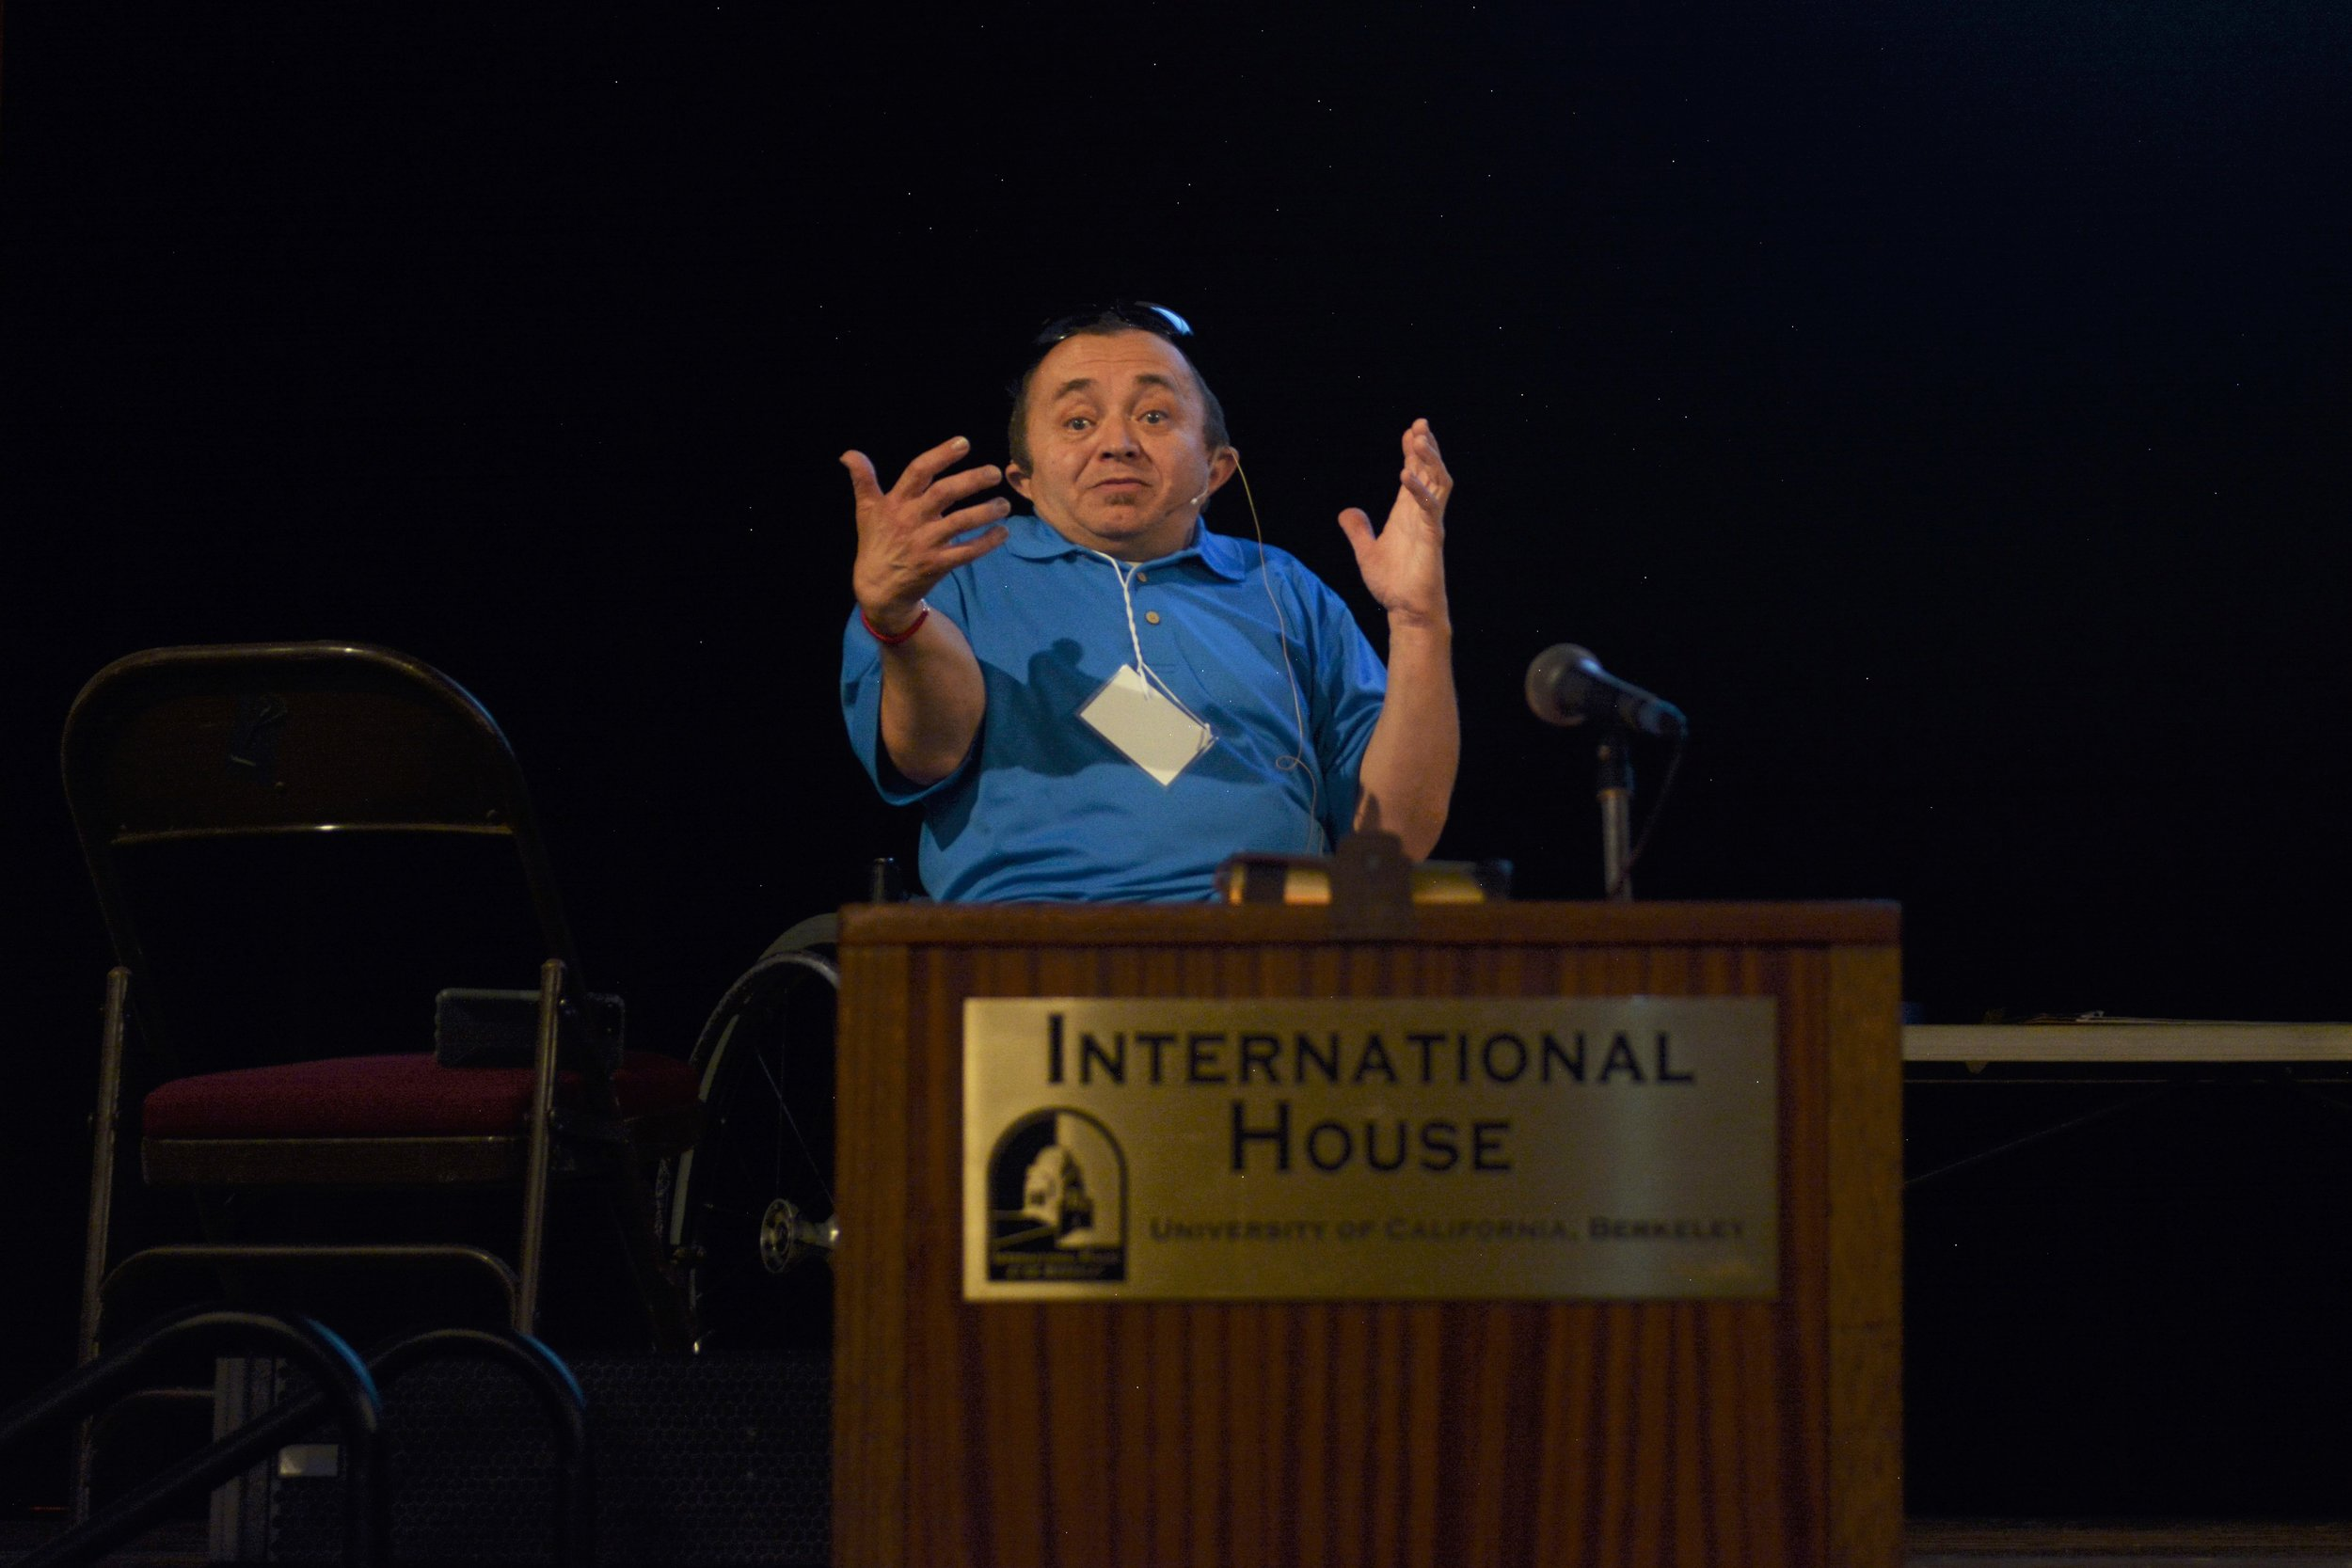 Stuart James facilitating a talk on social enterprise and its value